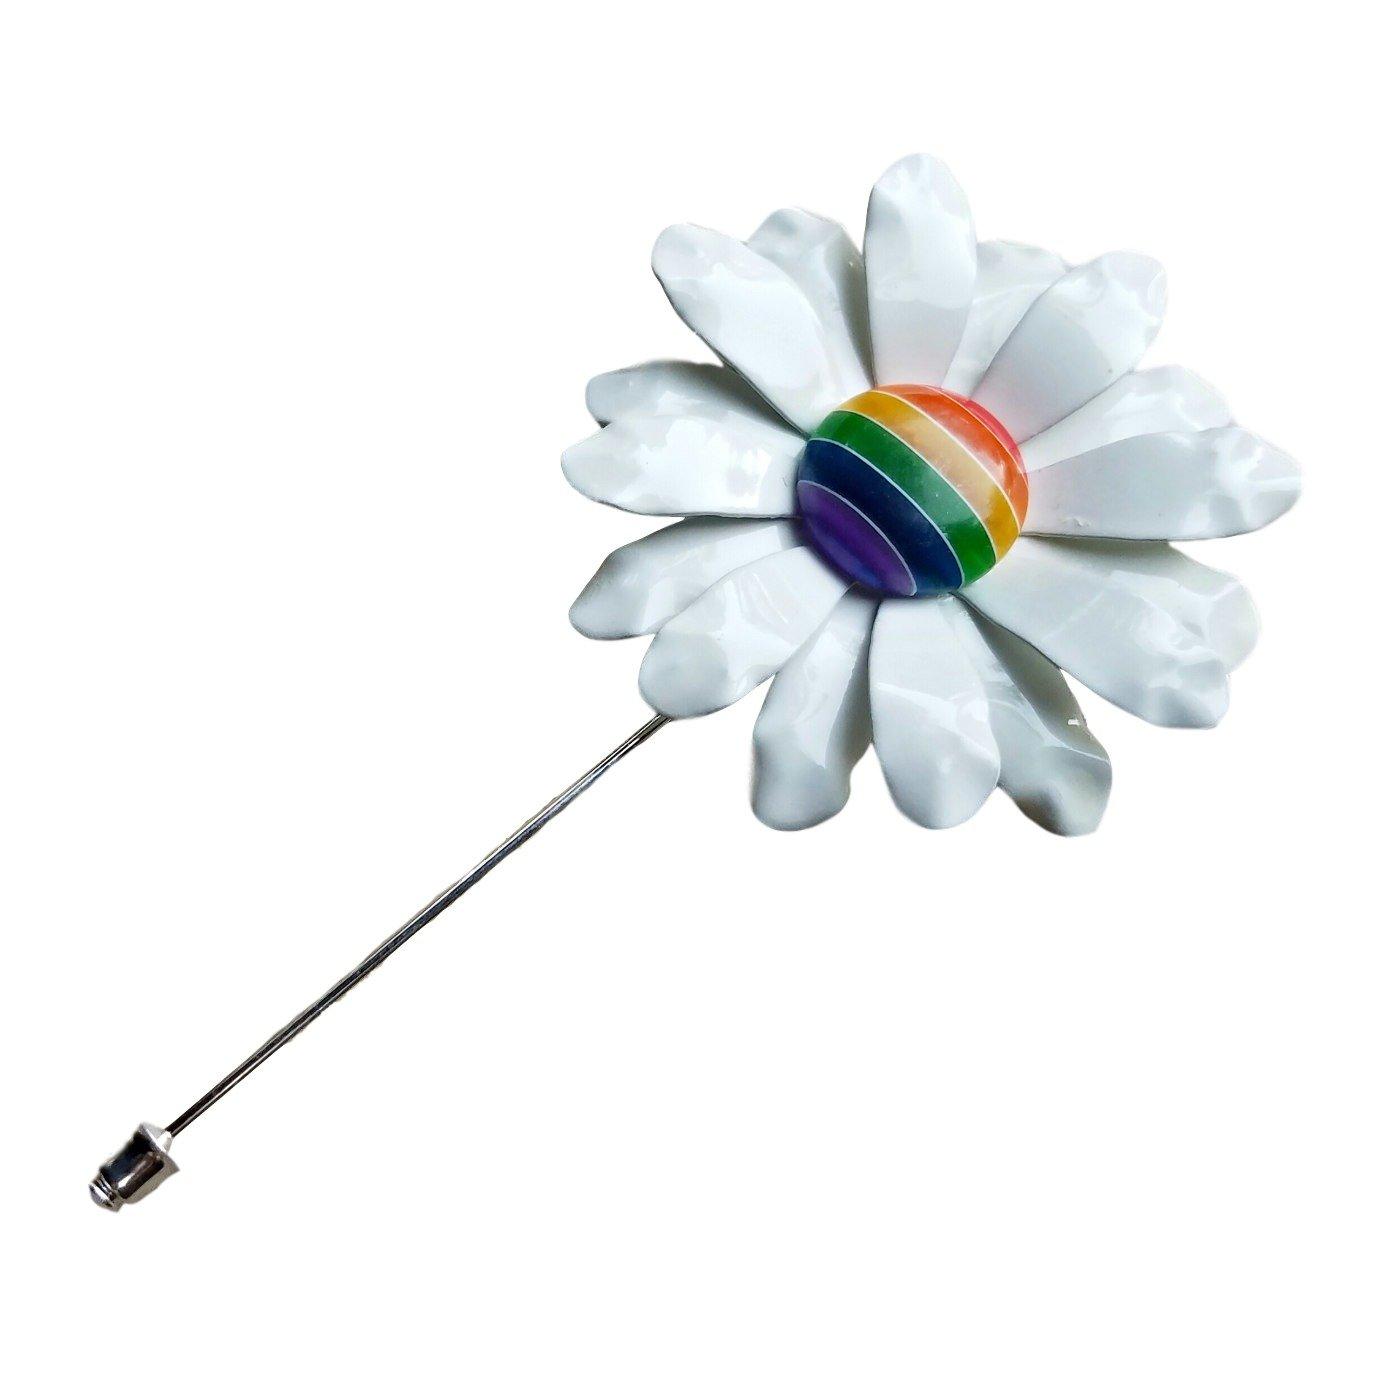 Rainbow Lapel Flower Pin, Ruffled Daisy